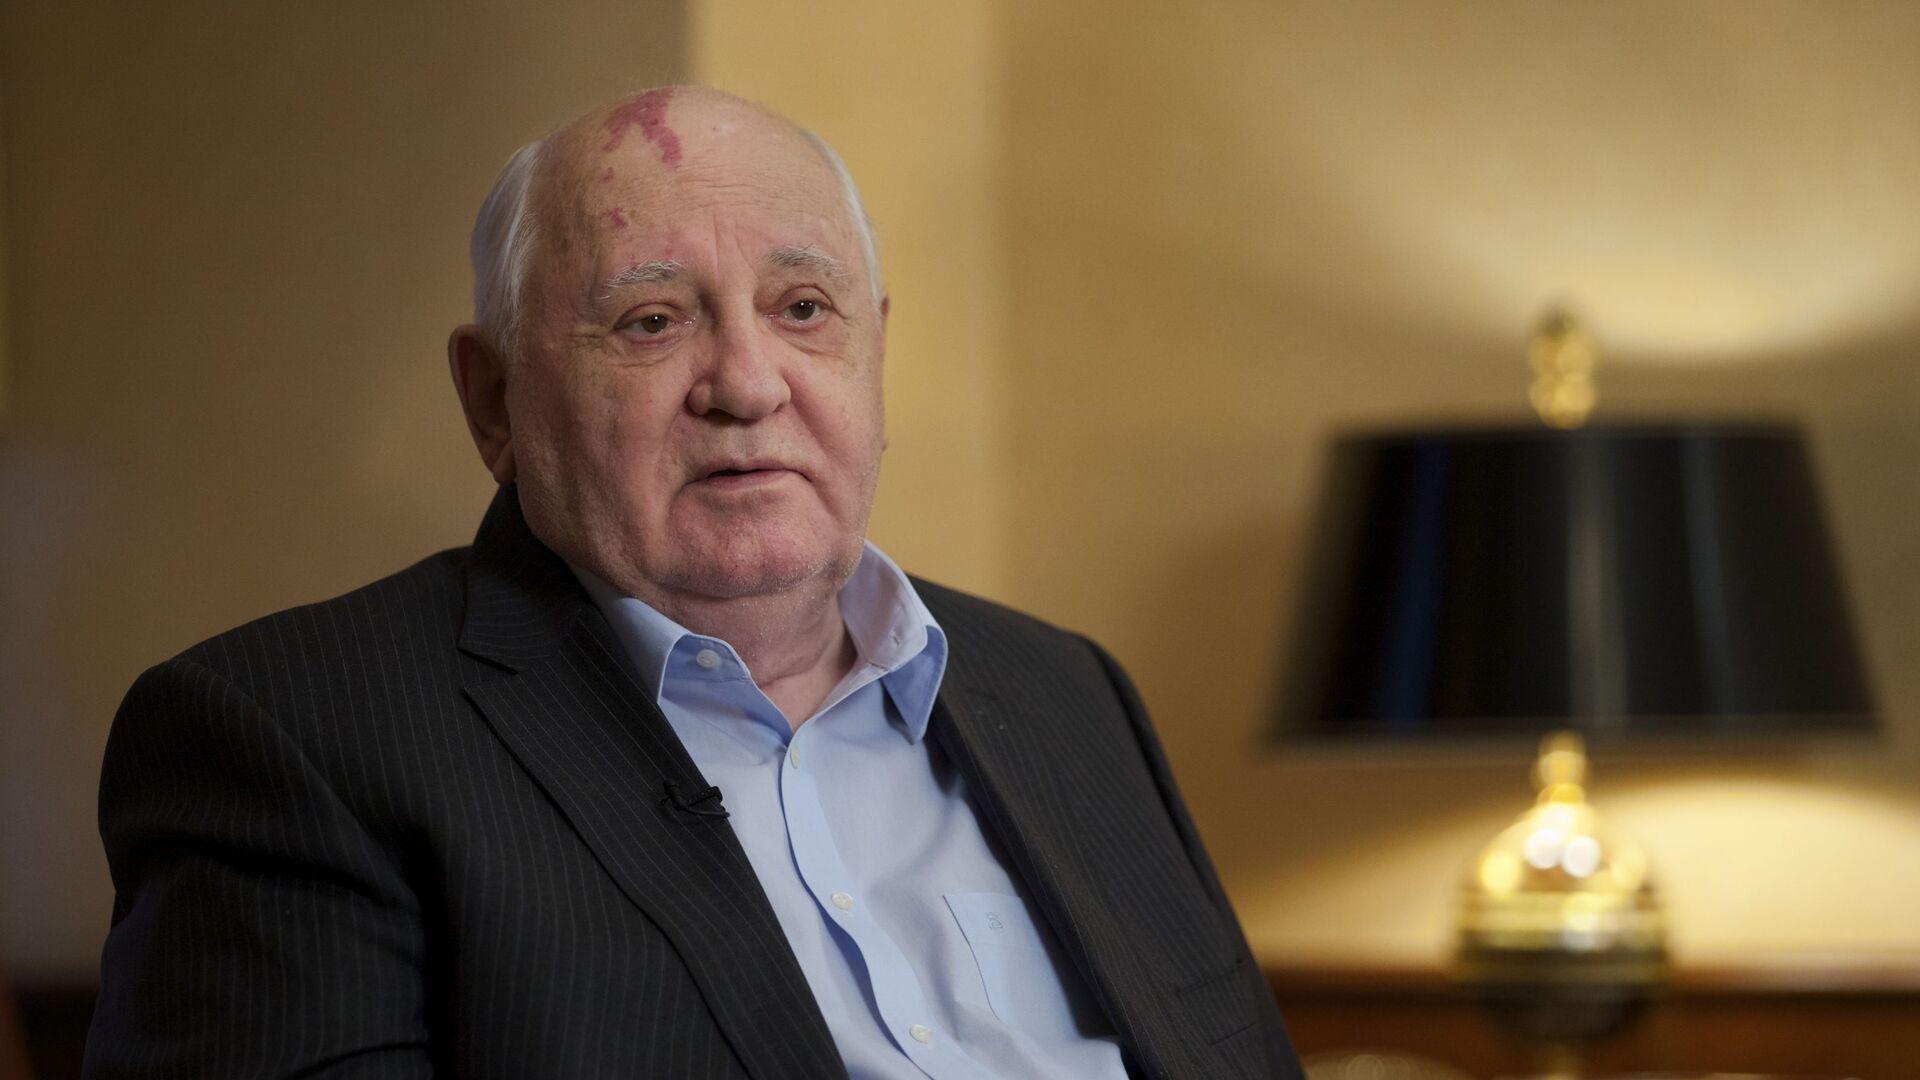 Mijaíl Gorbachov, expresidente de la URSS - Sputnik Mundo, 1920, 25.05.2021